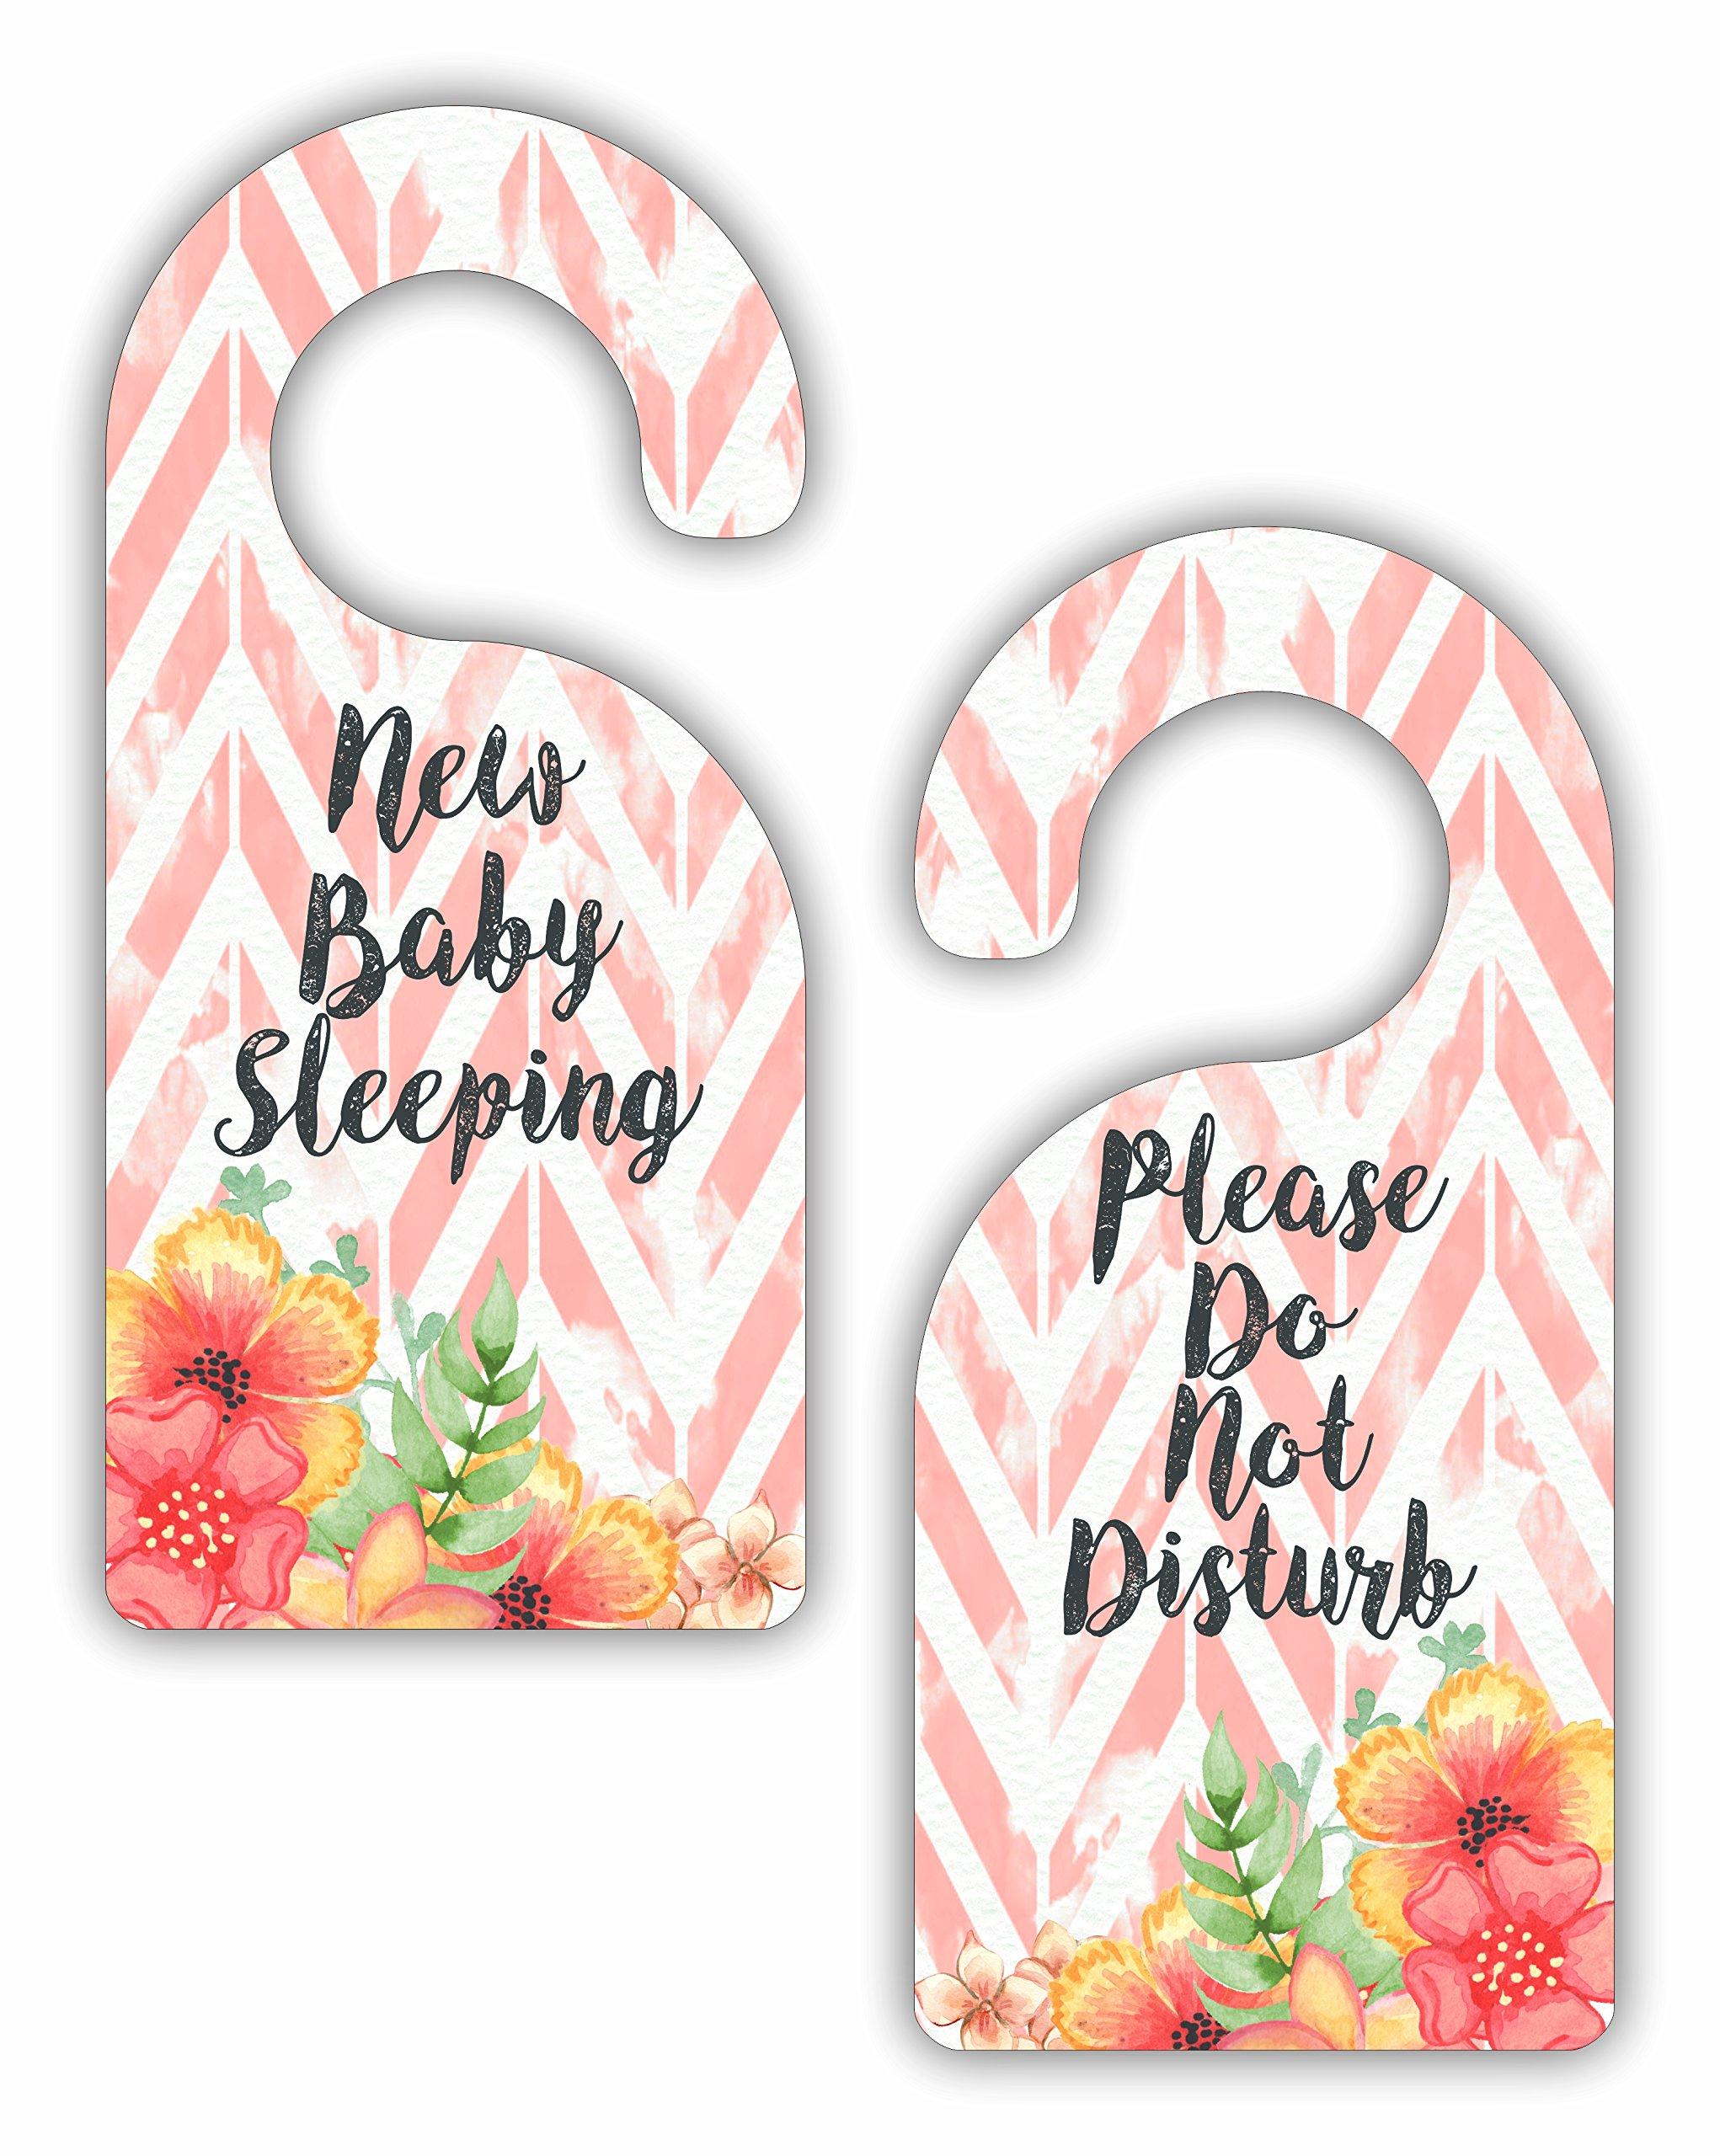 New Baby Sleeping - Please Do Not Disturb - Girls Nursery Room Door Sign Hanger - Double Sided - Hard Plastic - Glossy Finish